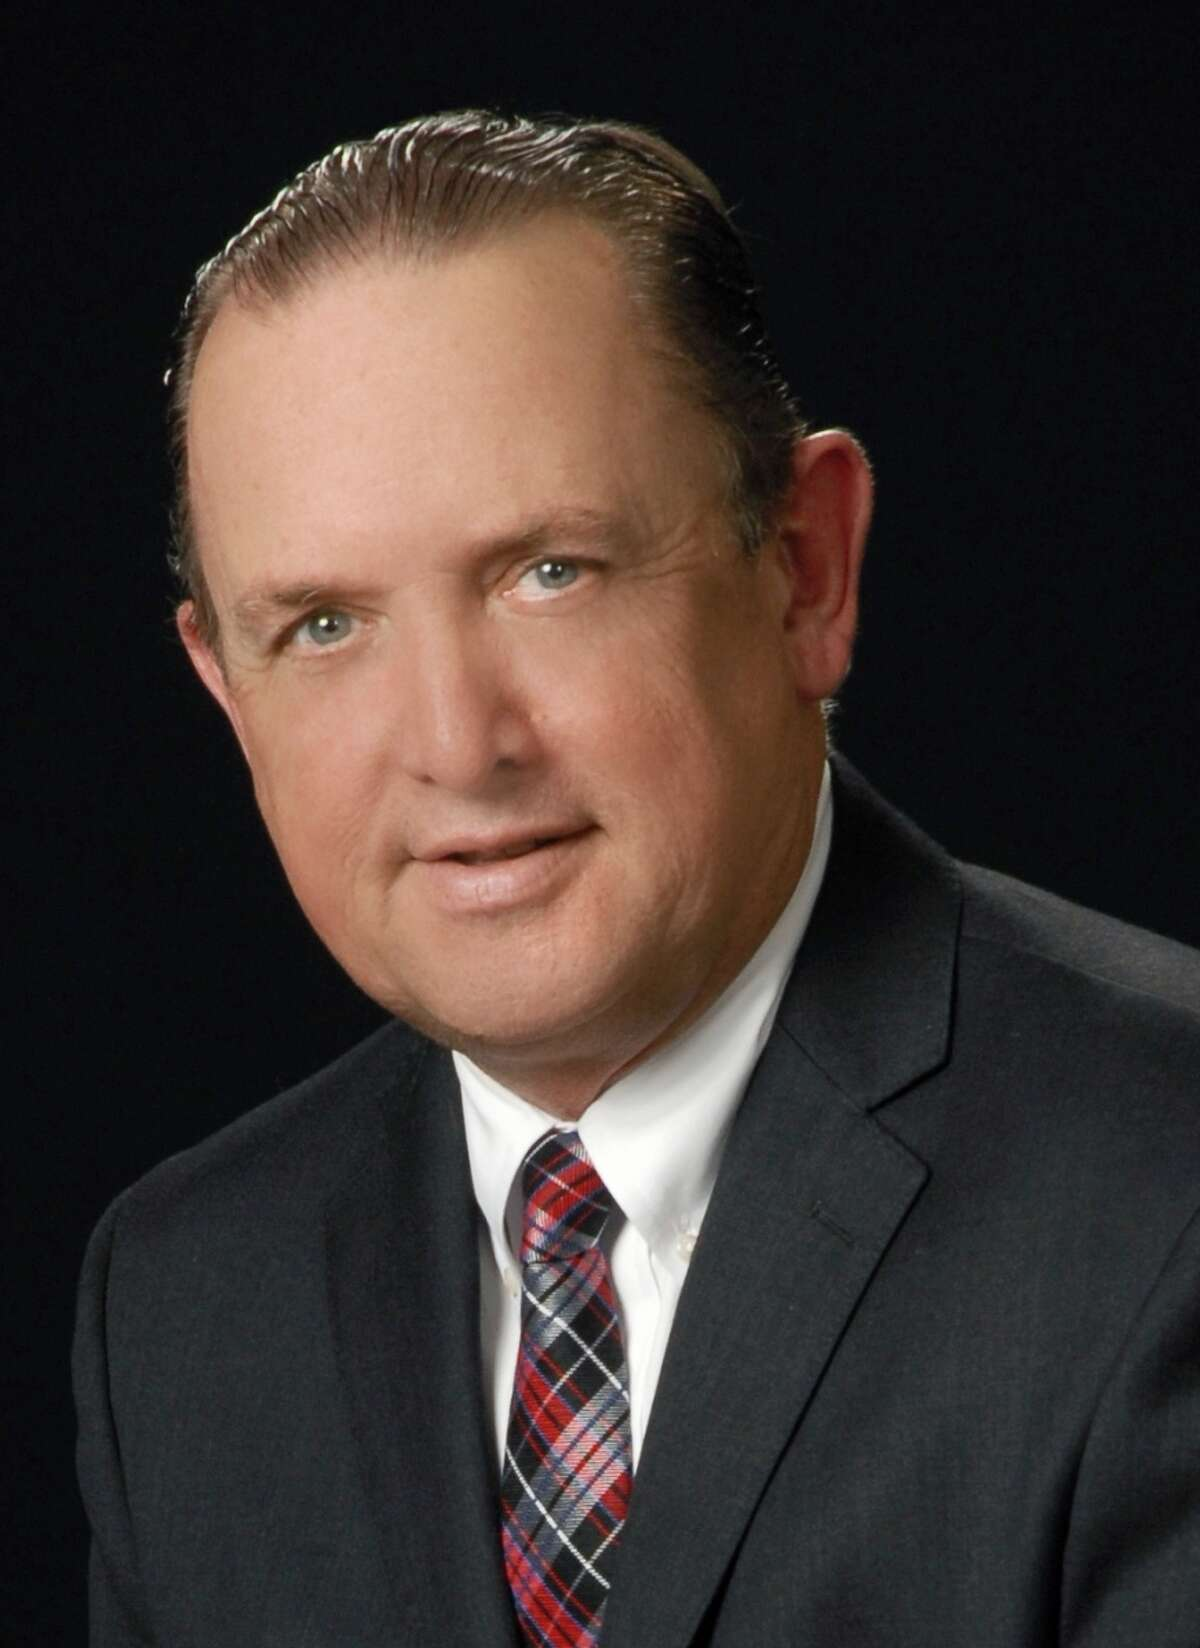 Dallas real estate broker David Winans, author of Texaplex